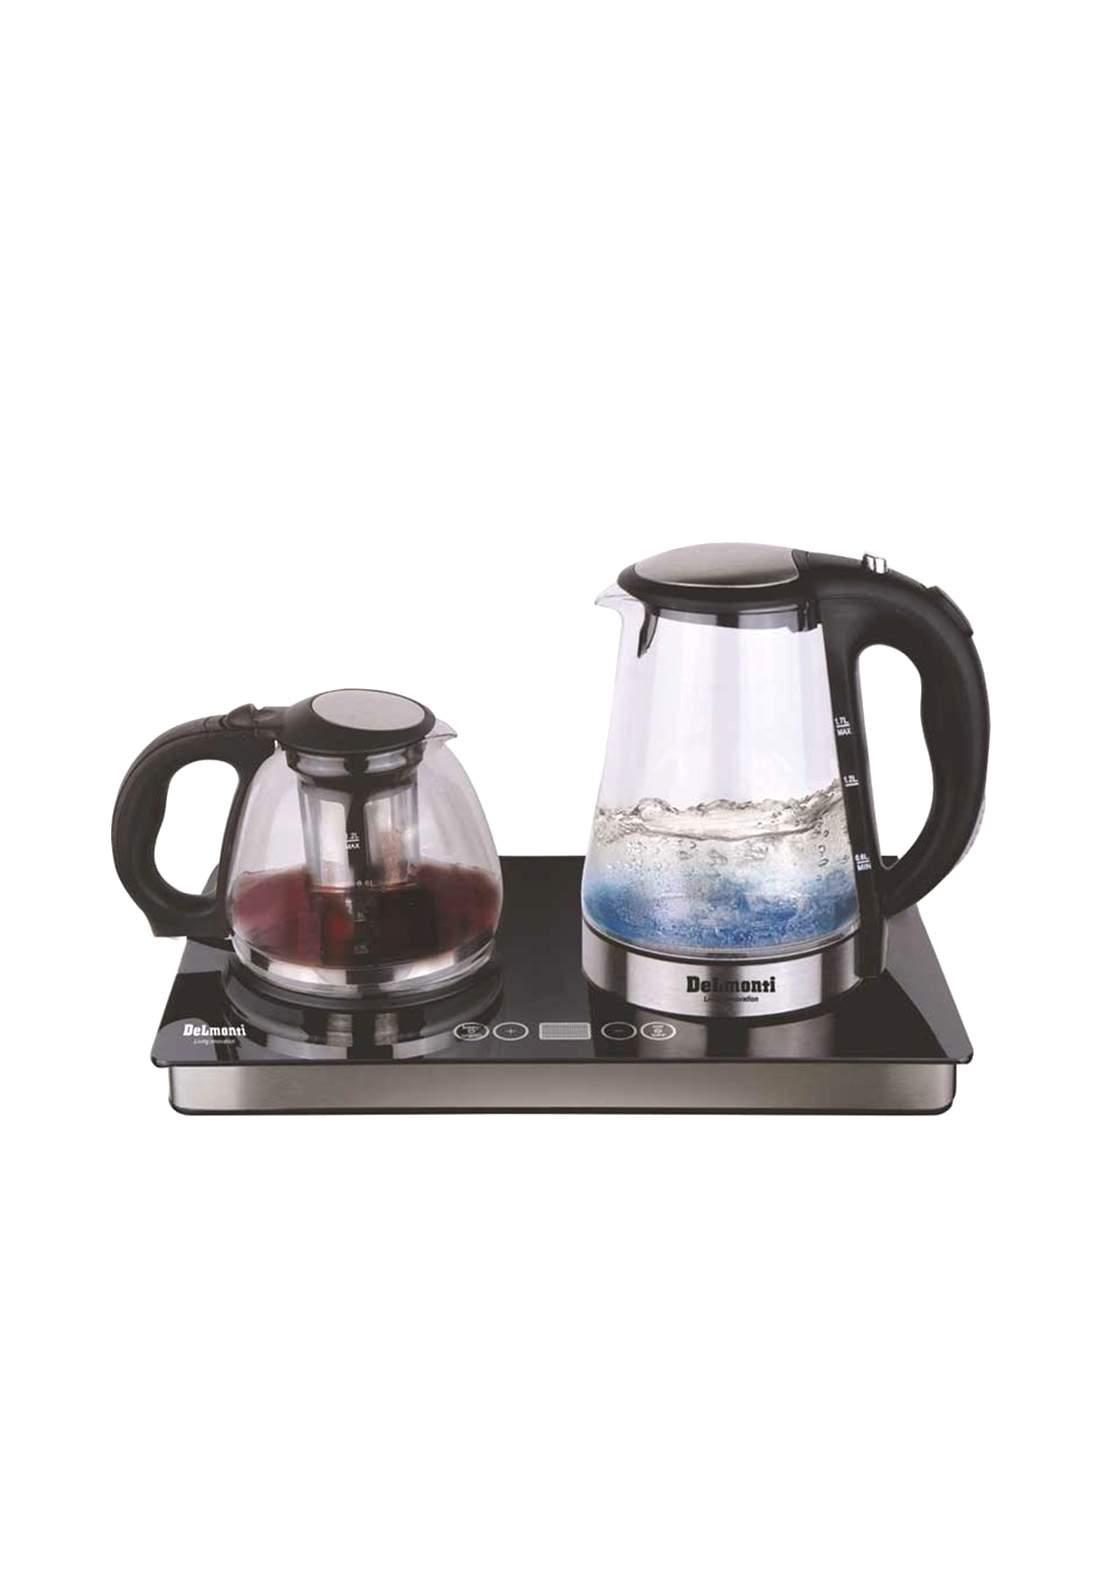 Delmonti DL420D Tea Maker ماكنة صنع شاي رقمية